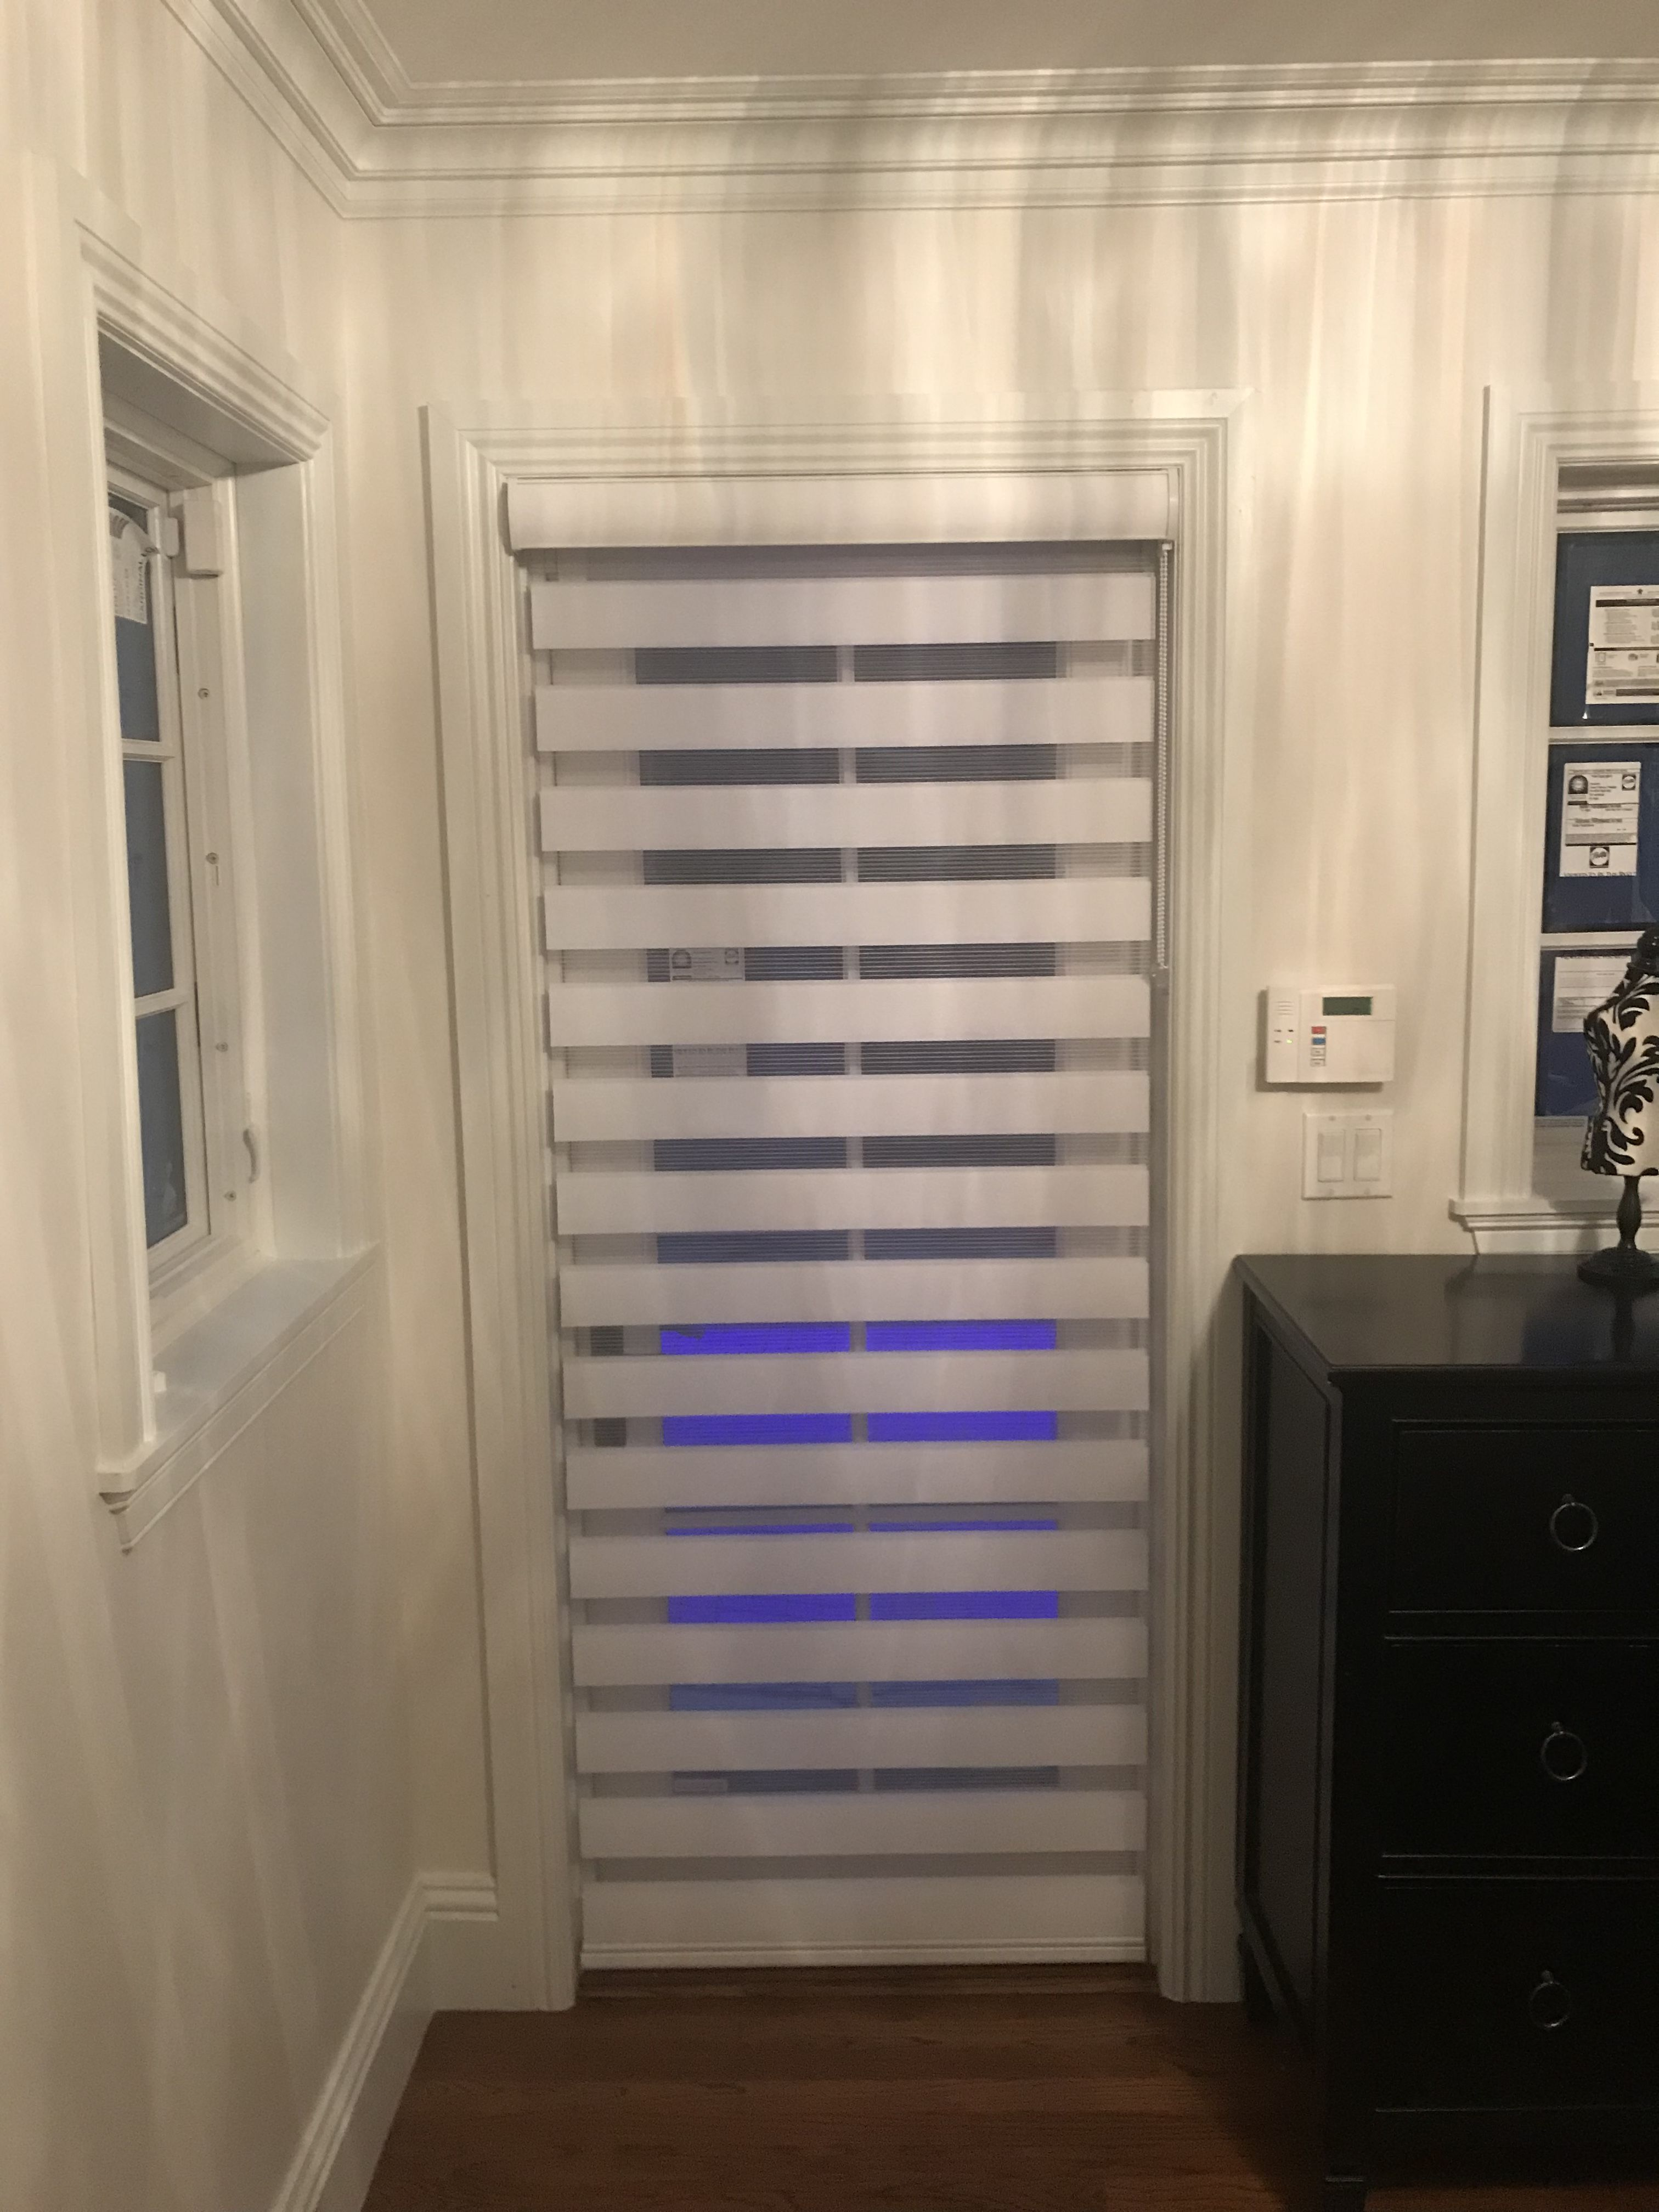 Door Zebra Illusion Privacy Shade by Elite Decor Miami & Door Zebra Illusion Privacy Shade by Elite Decor Miami | Door Blinds ...